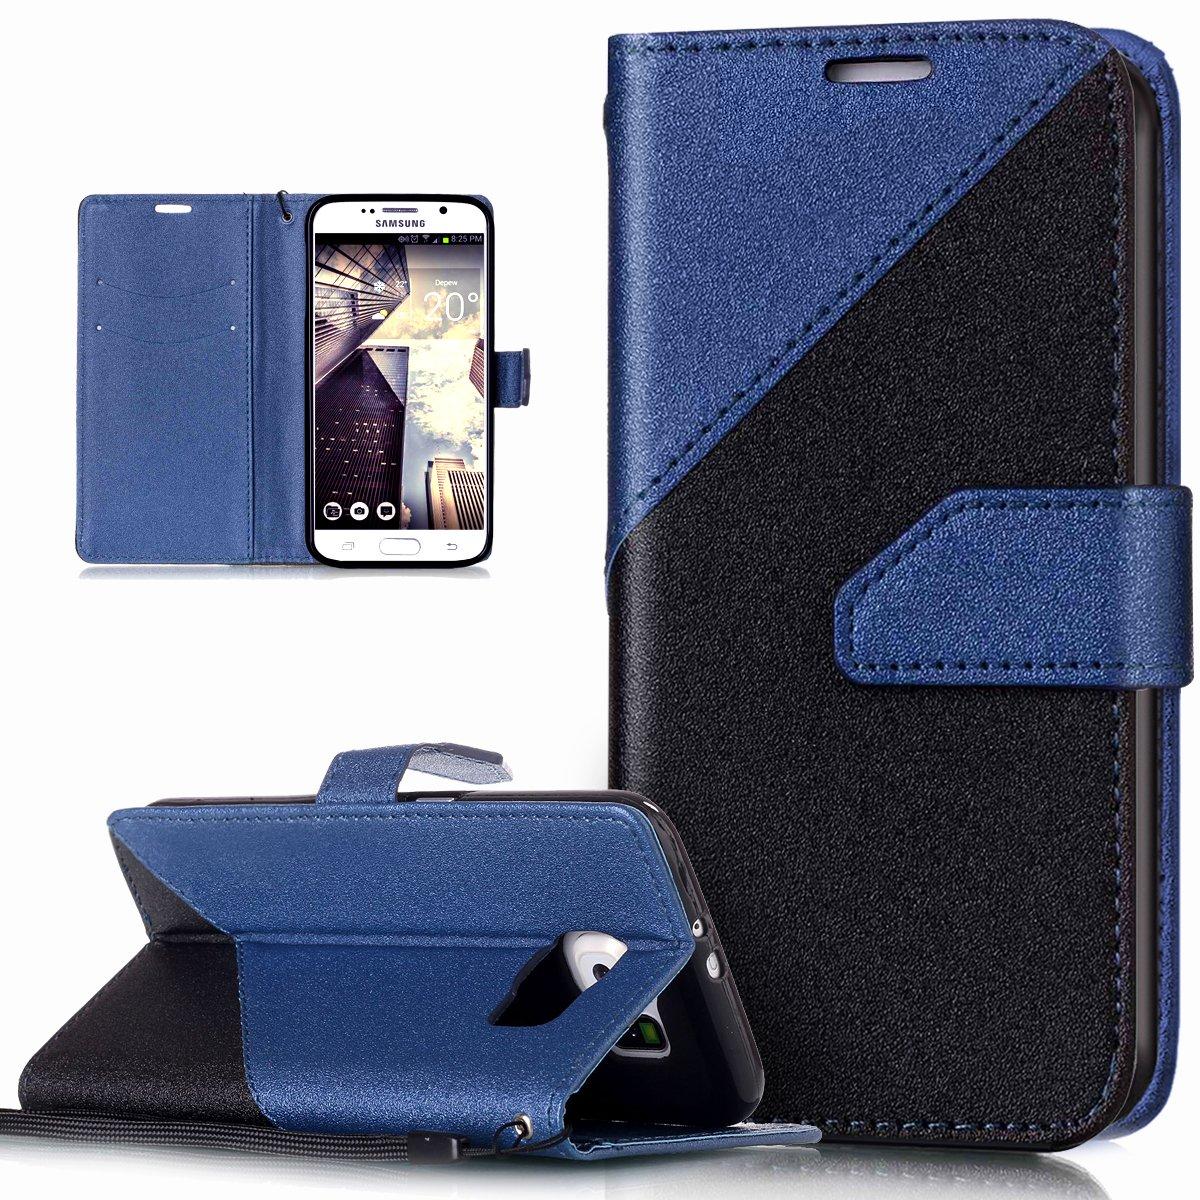 Galaxy S6 Hülle, Galaxy S6 Schutzhülle, Galaxy S6 Leder Hülle, ikasus® Schlagfarbe Nähte Spleiß Stil Naht Farben PU Lederhülle Flip Hülle im Bookstyle Cover Schale Slim Fit Soft Silikon Magnetverschluss Schutzhü